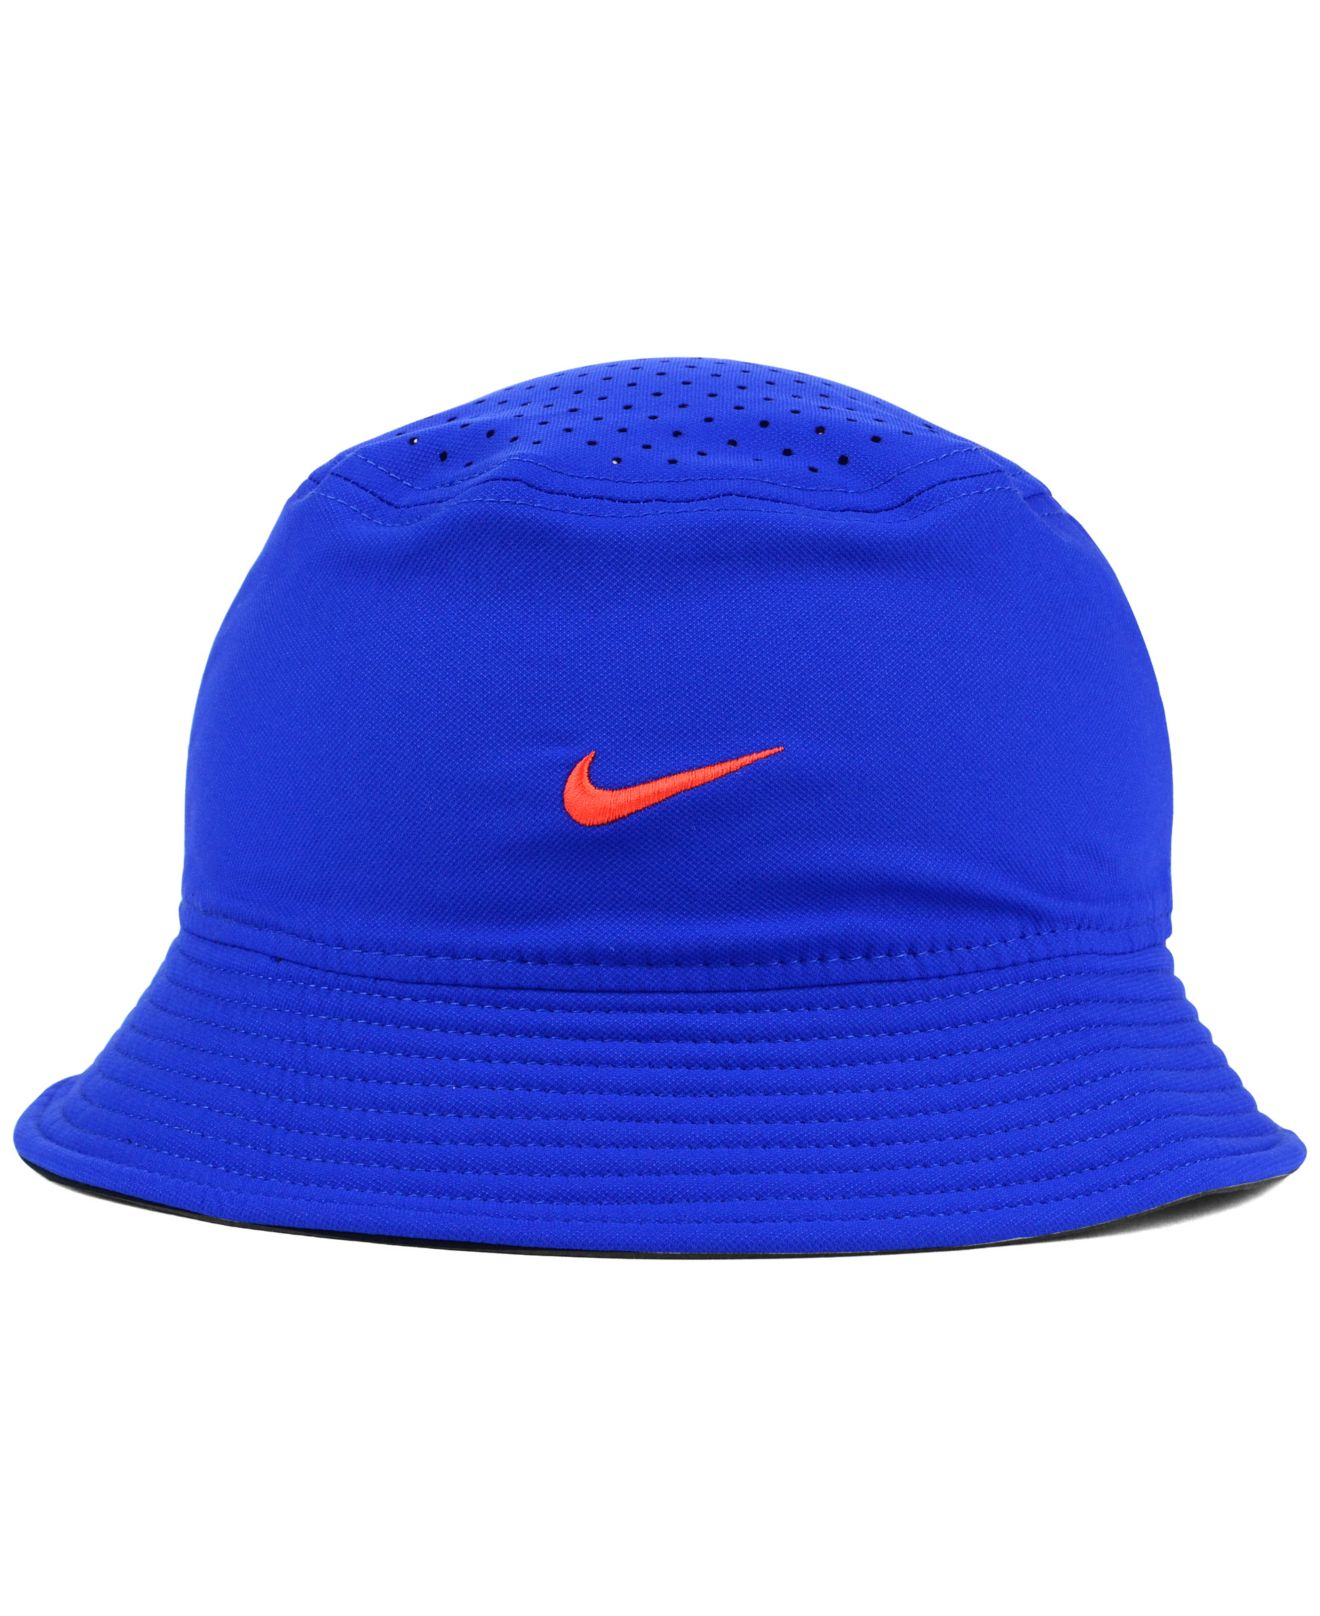 huge discount e09c6 82b0c Nike Florida Gators Vapor Bucket Hat in Blue for Men - Lyst